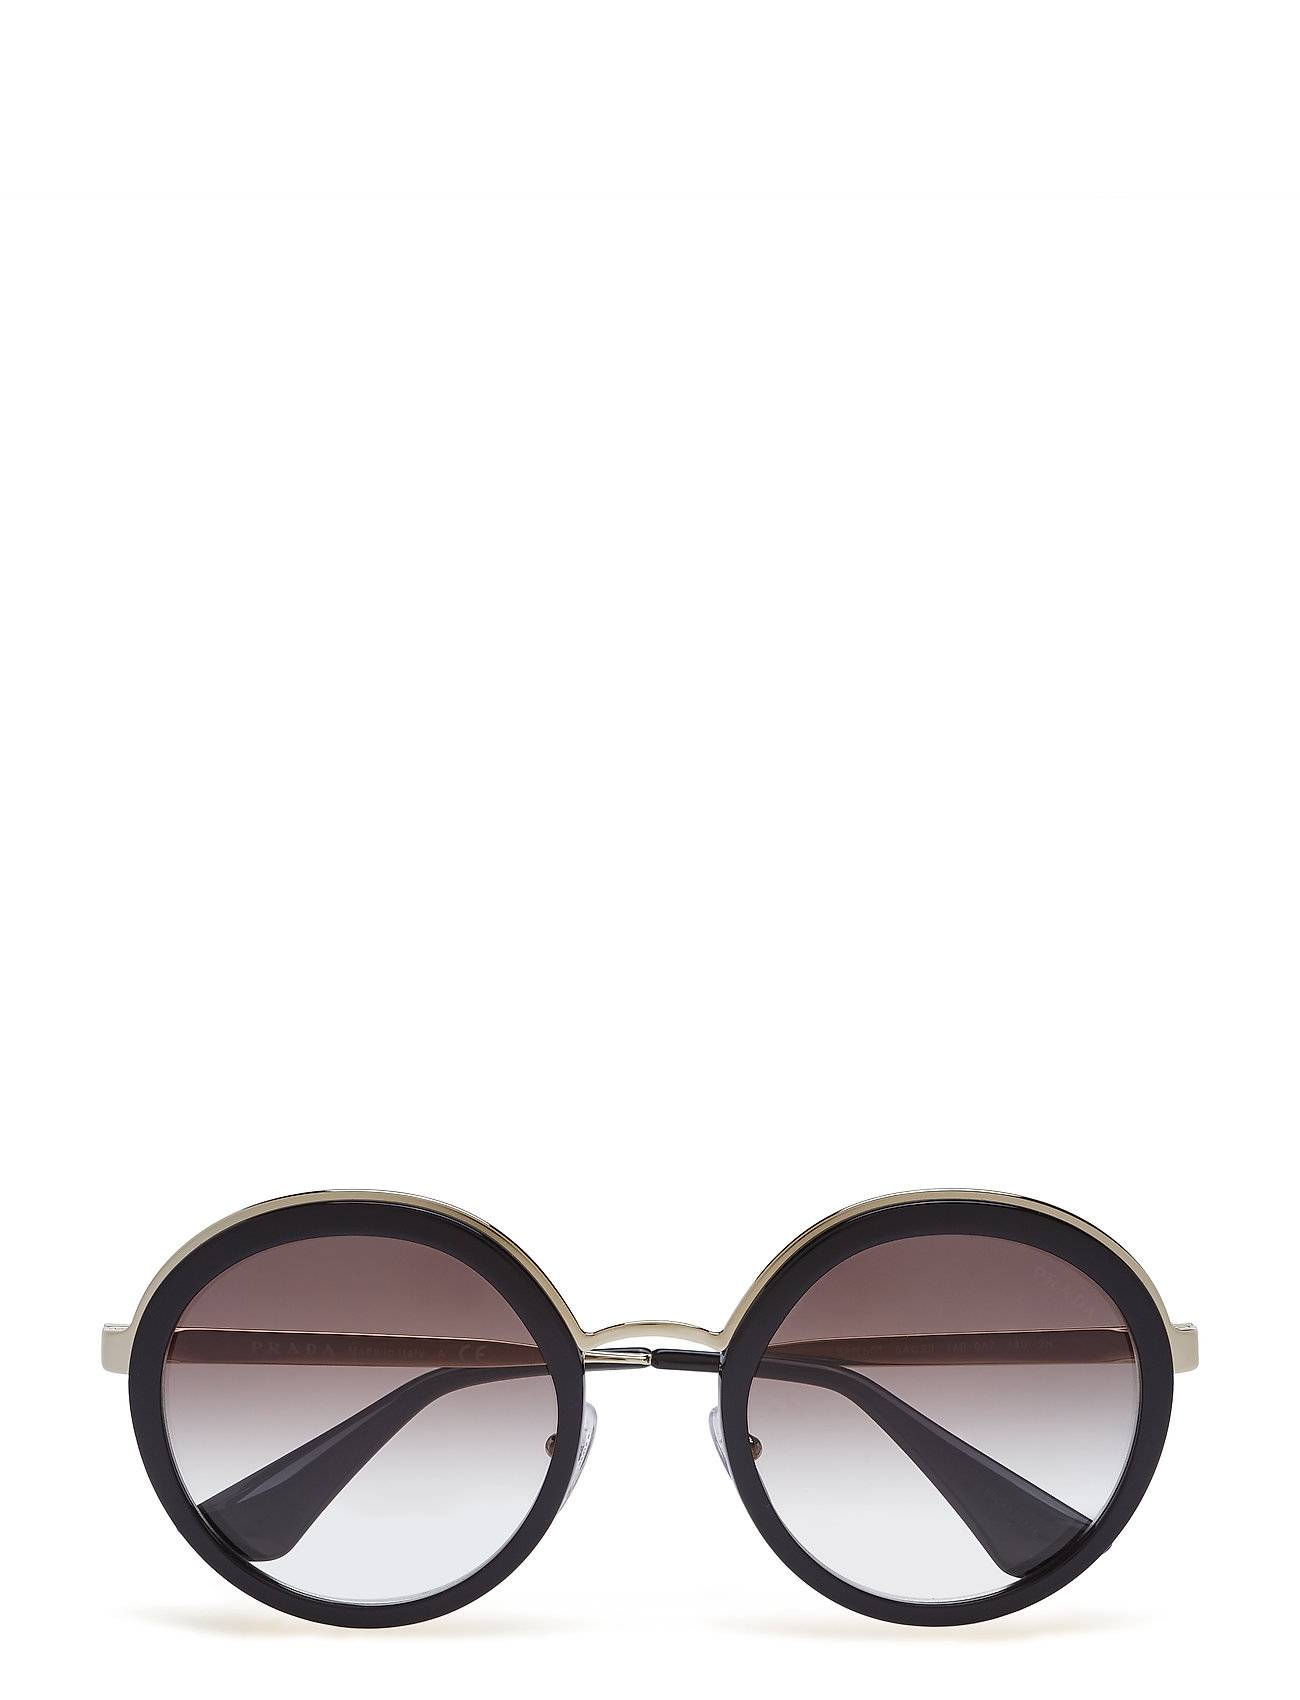 Image of Prada Sunglasses 0pr 50ts Aurinkolasit Musta